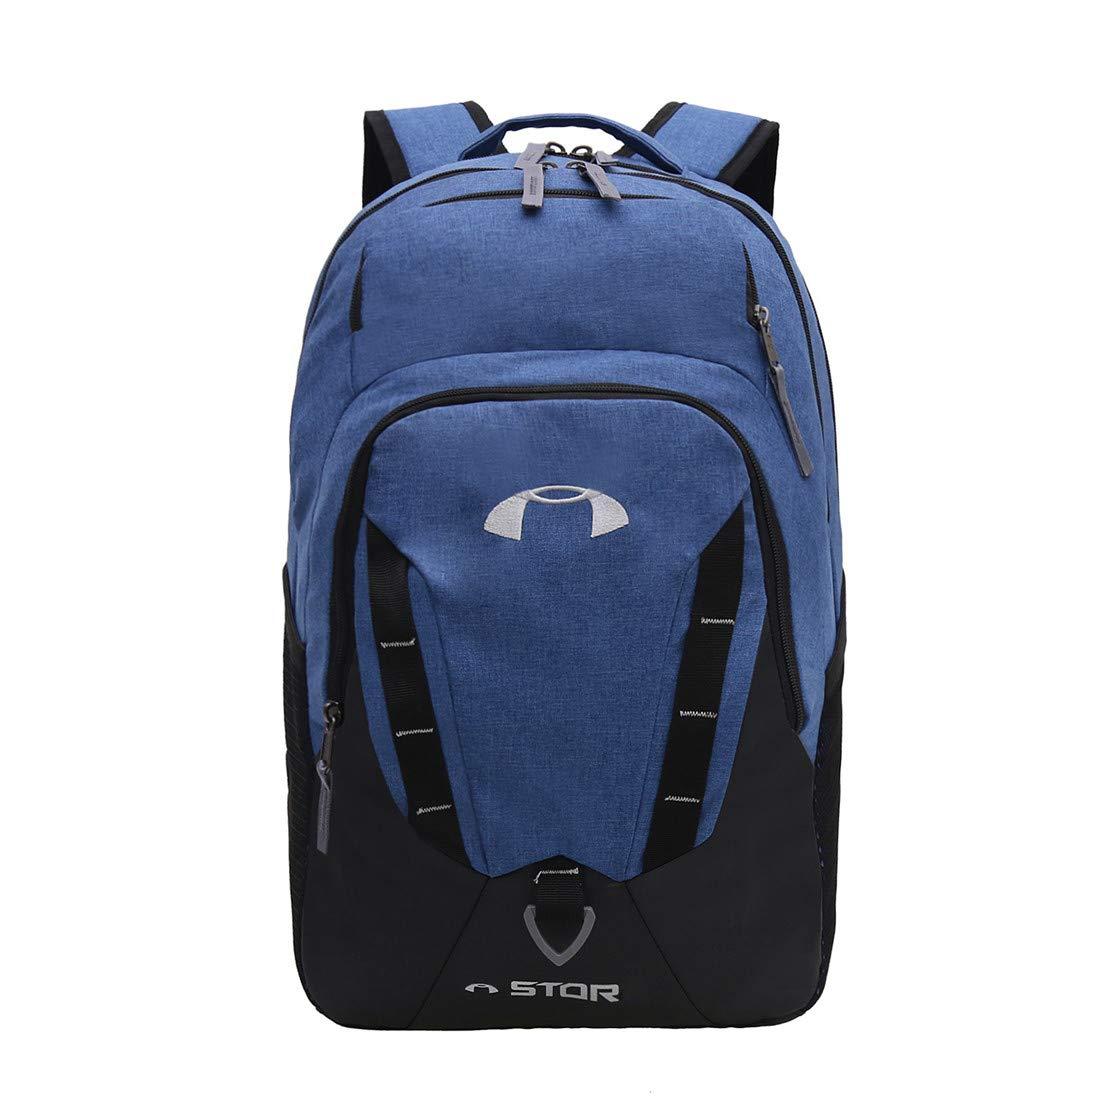 krstay Hommes Sac dalpinisme Grande Capacit/é Sac de Taille Voyage Camping Backpack Trekking Daypack Mode /Étudiants Sac /à Dos de Sport